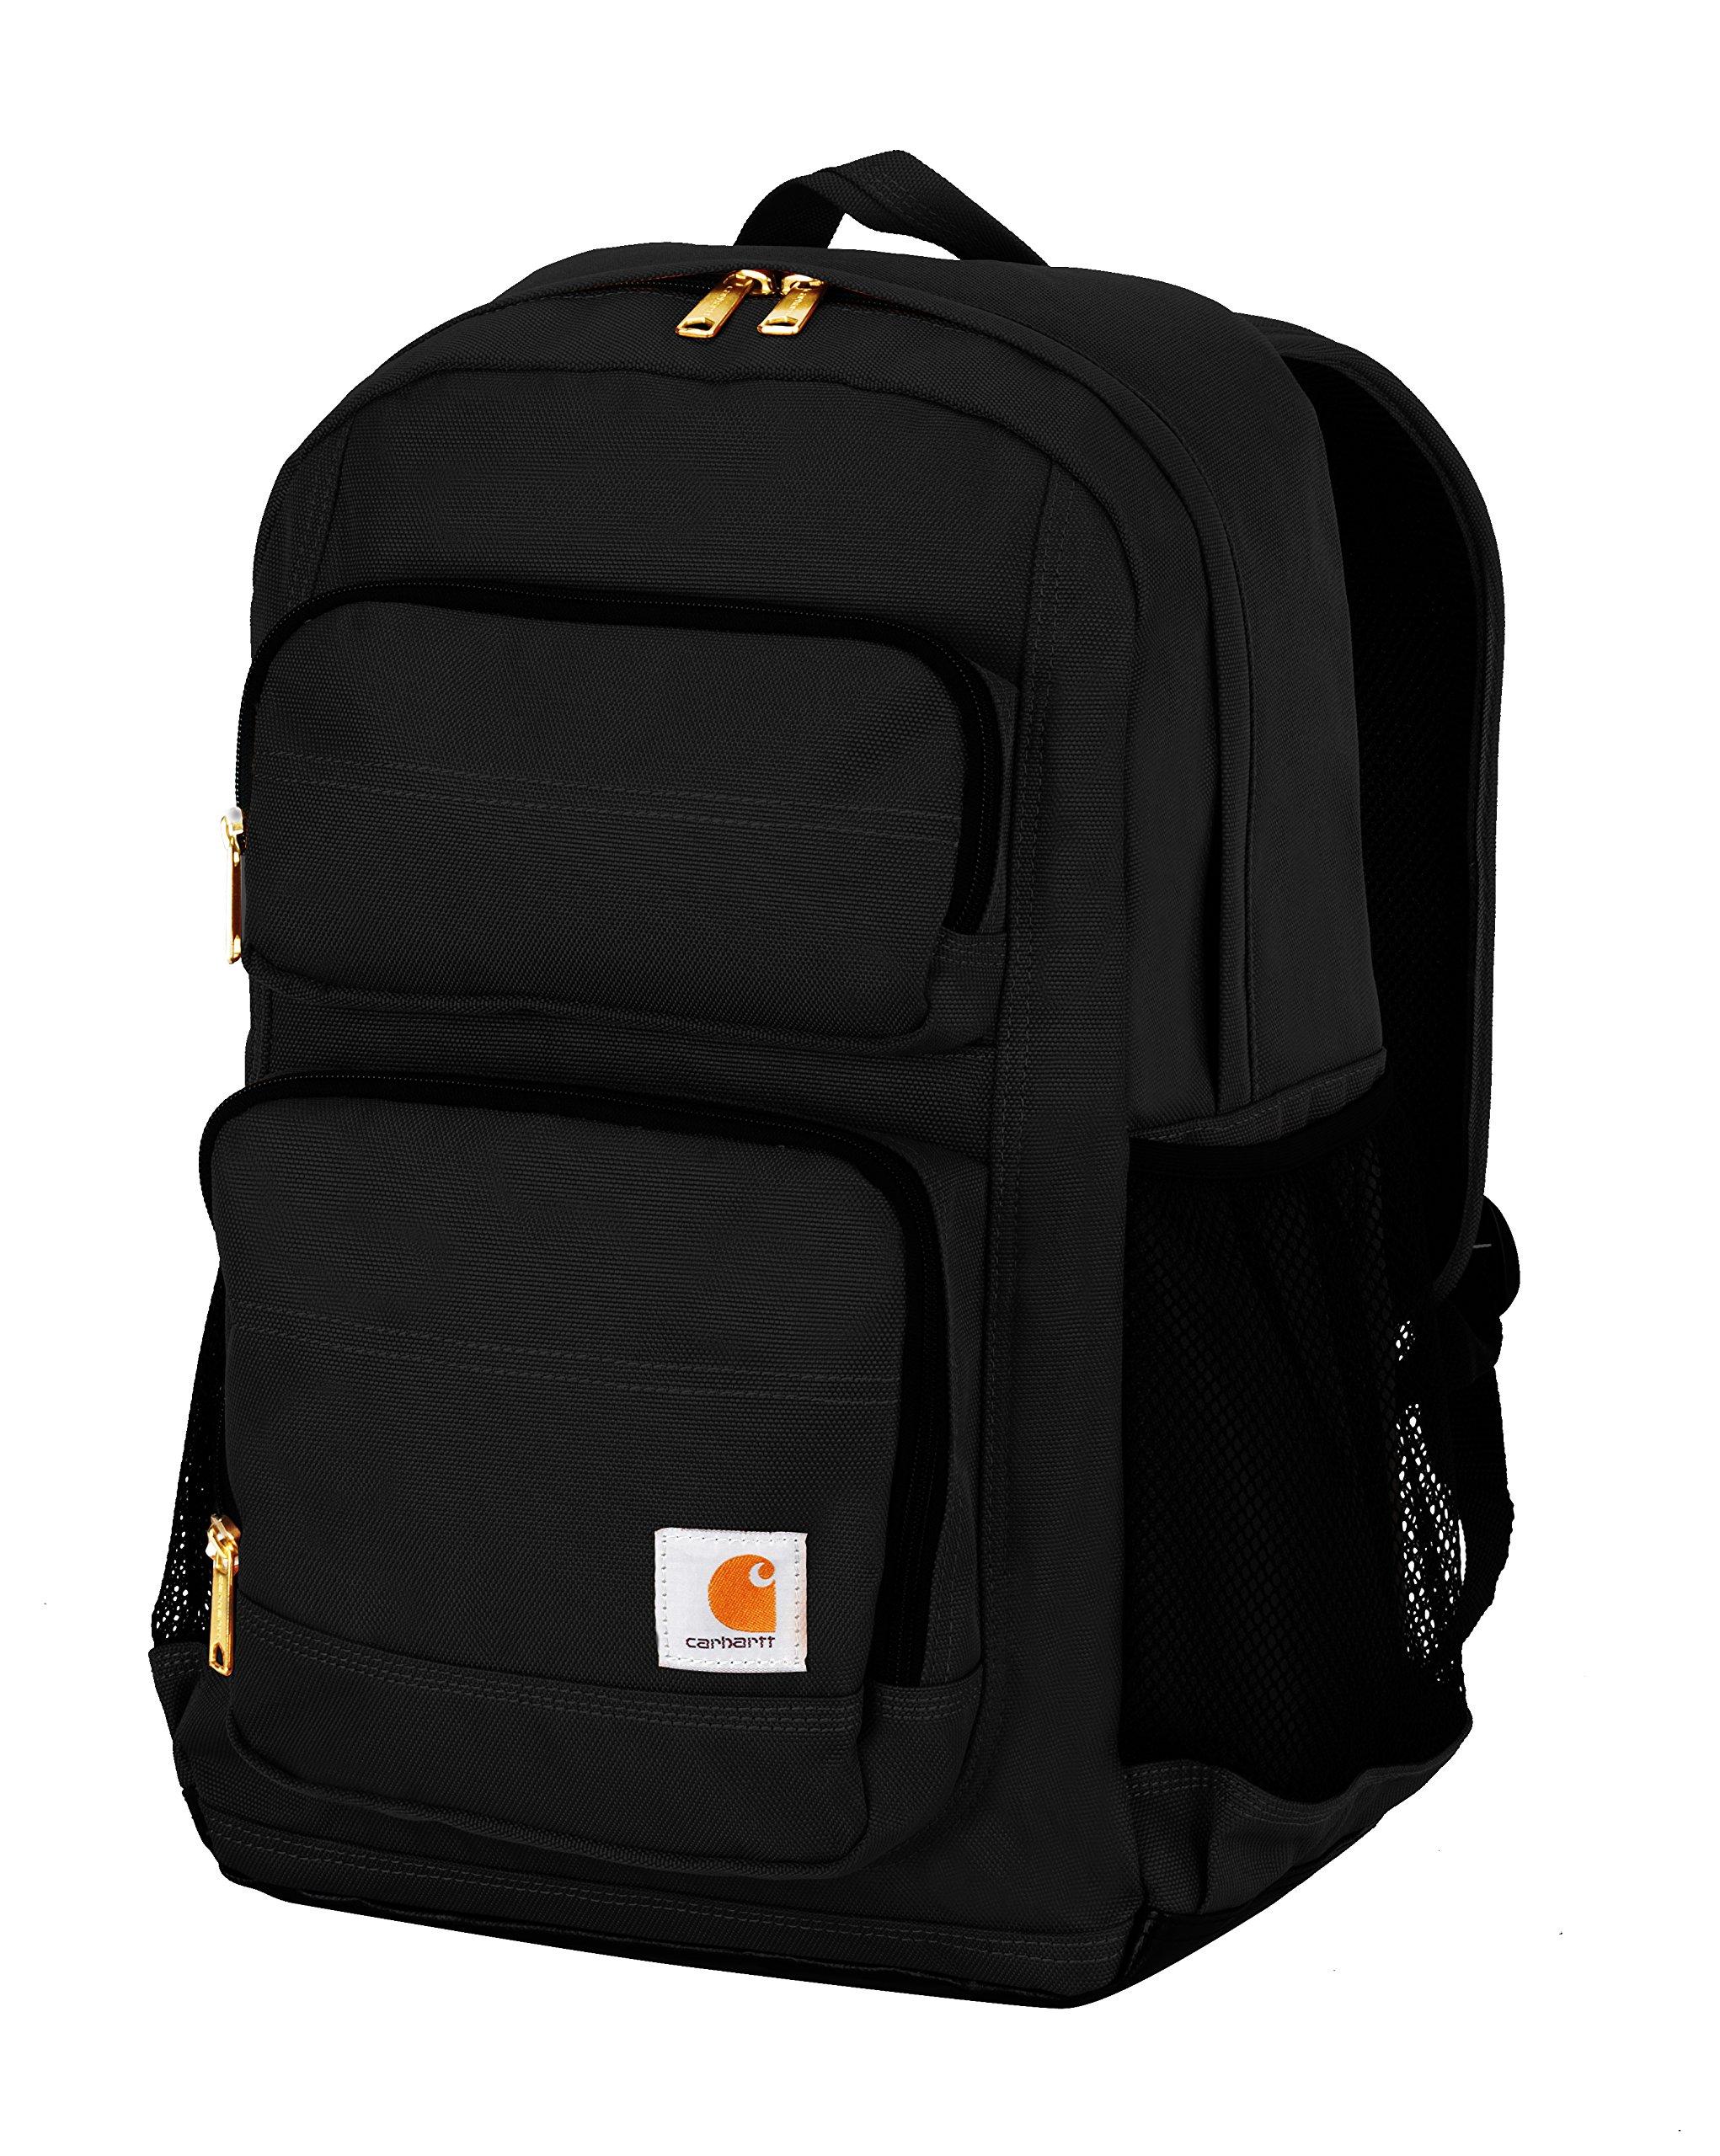 Carhartt Legacy Standard Backpack Storage